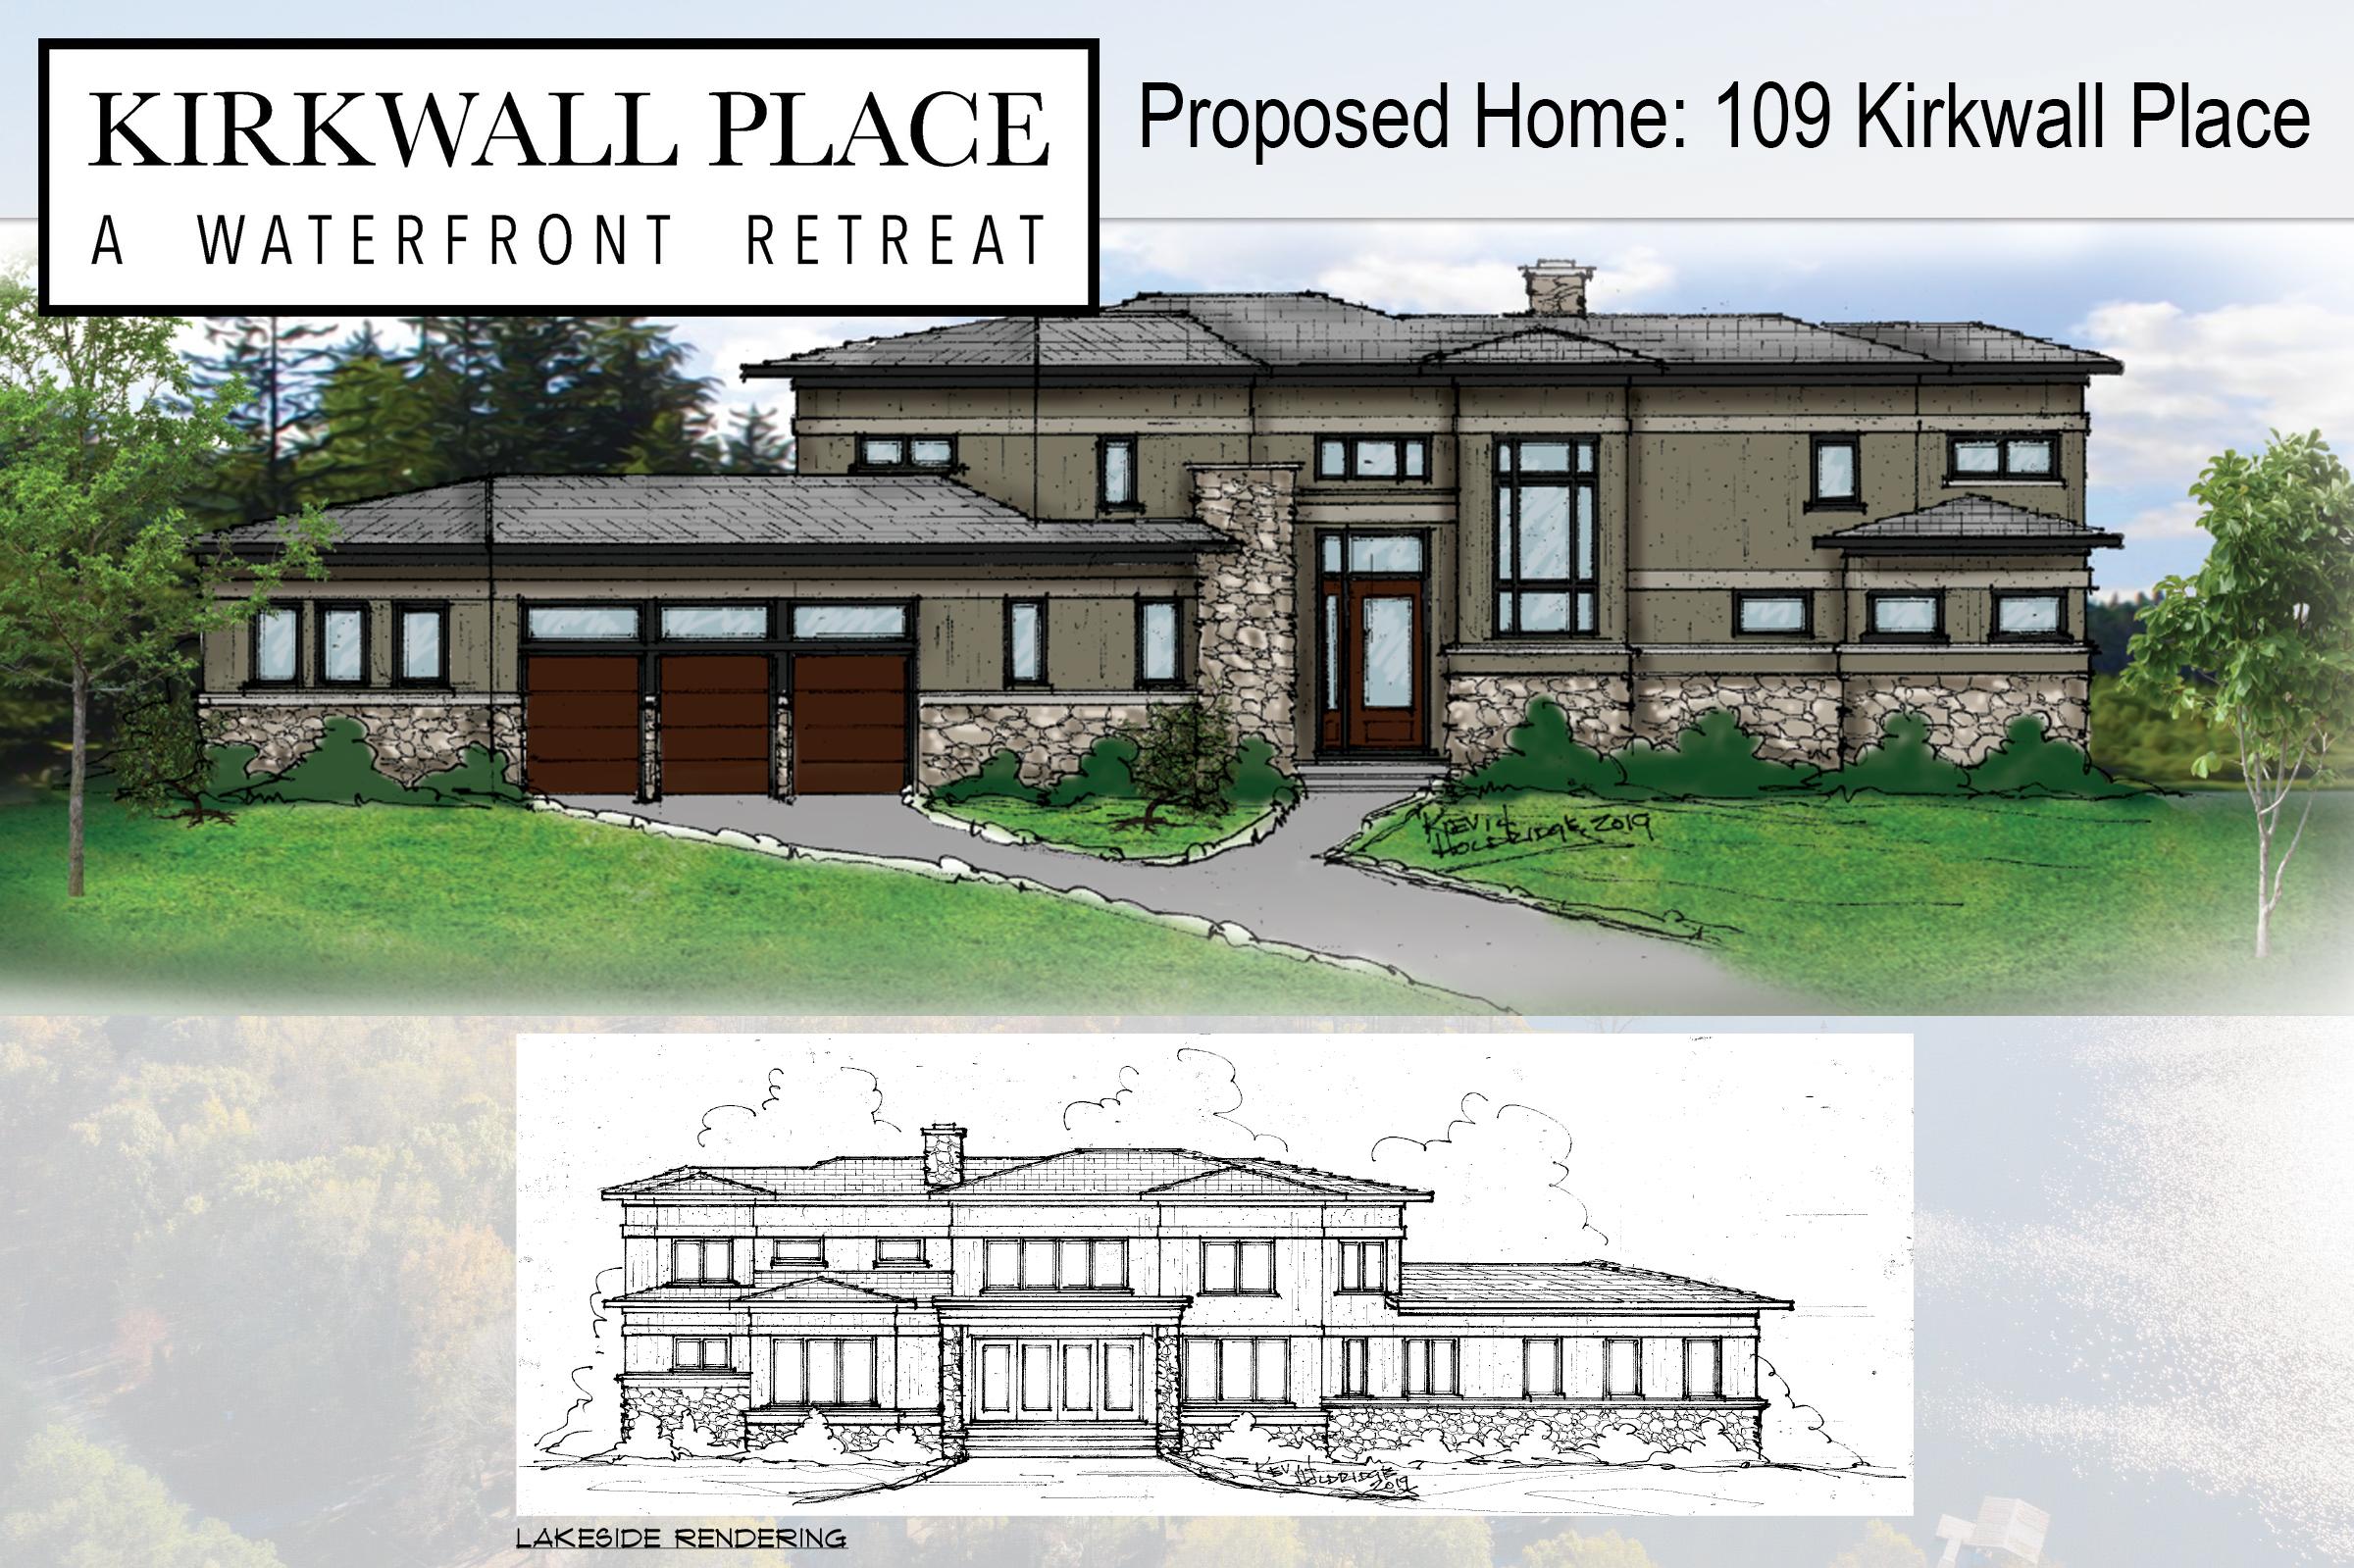 Renderings of Proposed Home